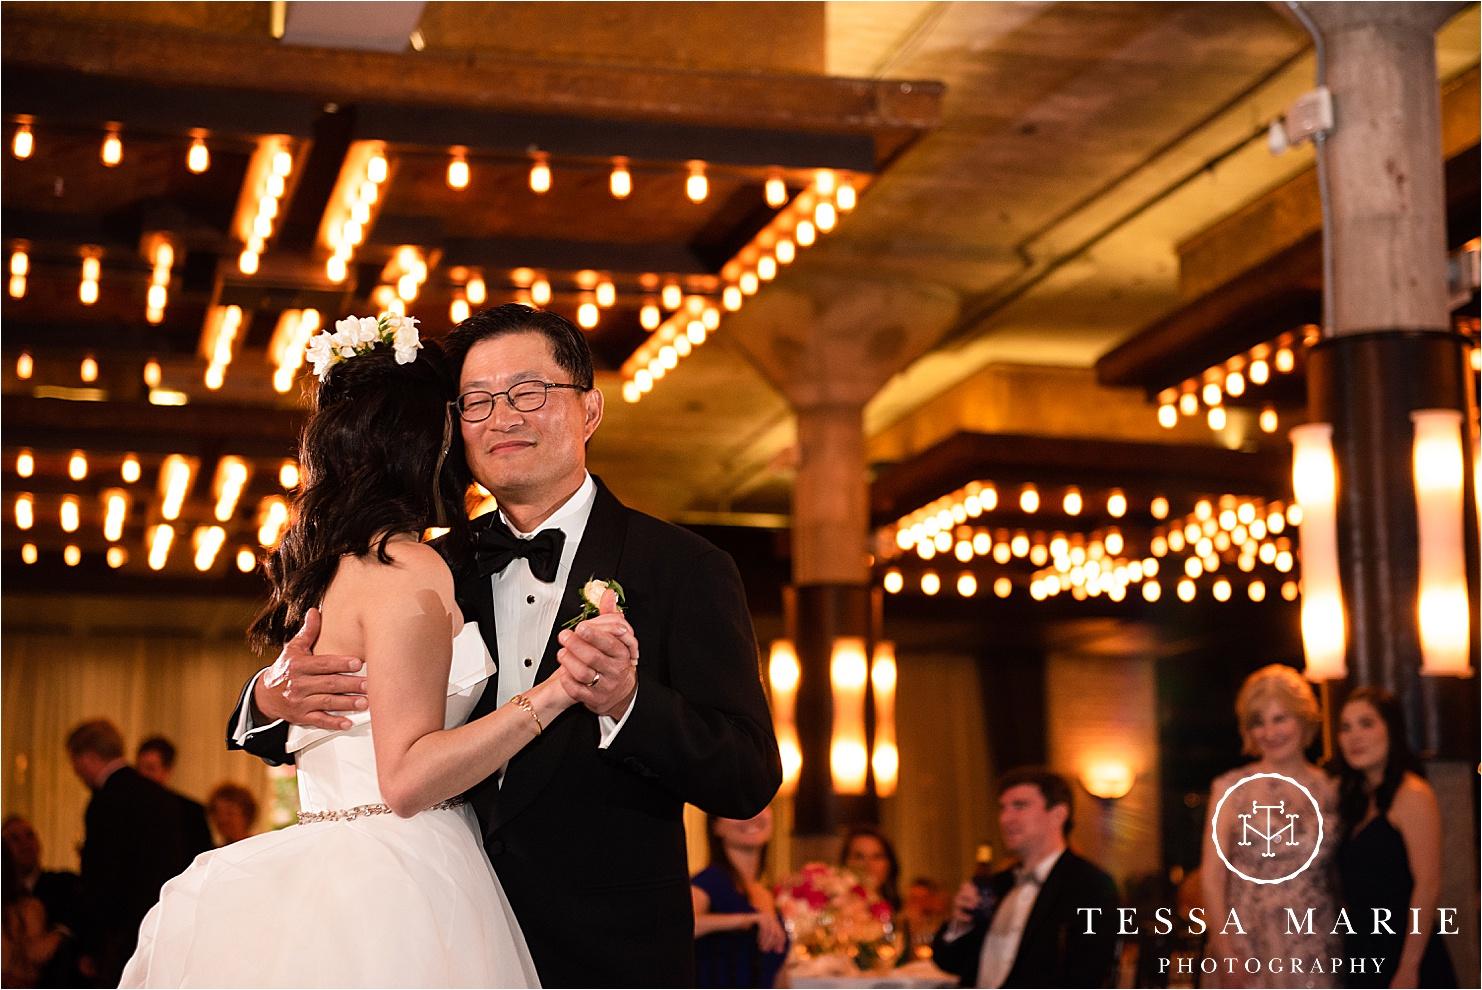 Tessa_marie_weddings_houston_wedding_photographer_The_astorian_0168.jpg